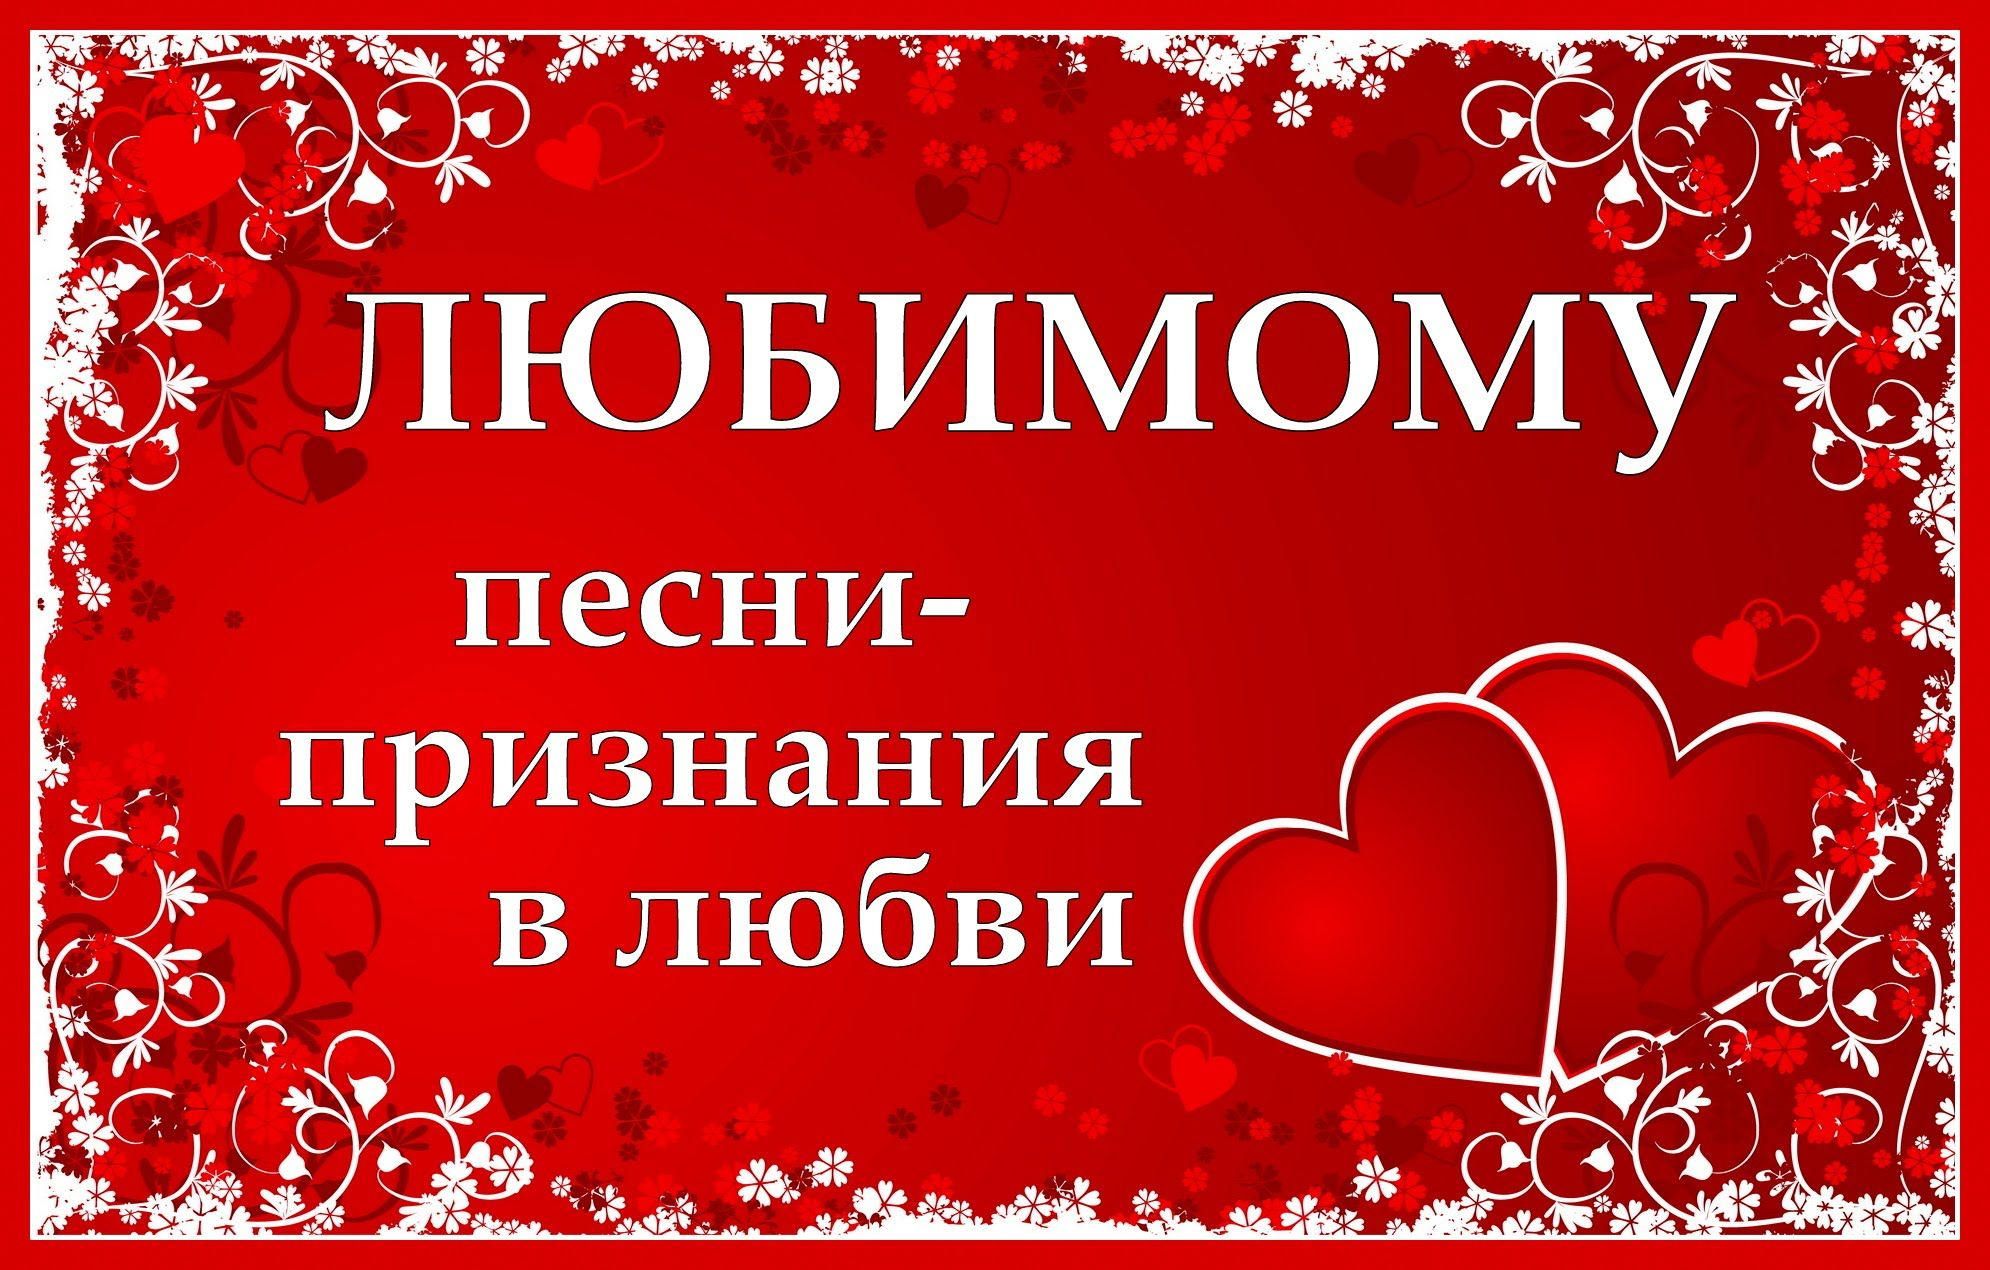 Признание в любви любимому мужчине мужу